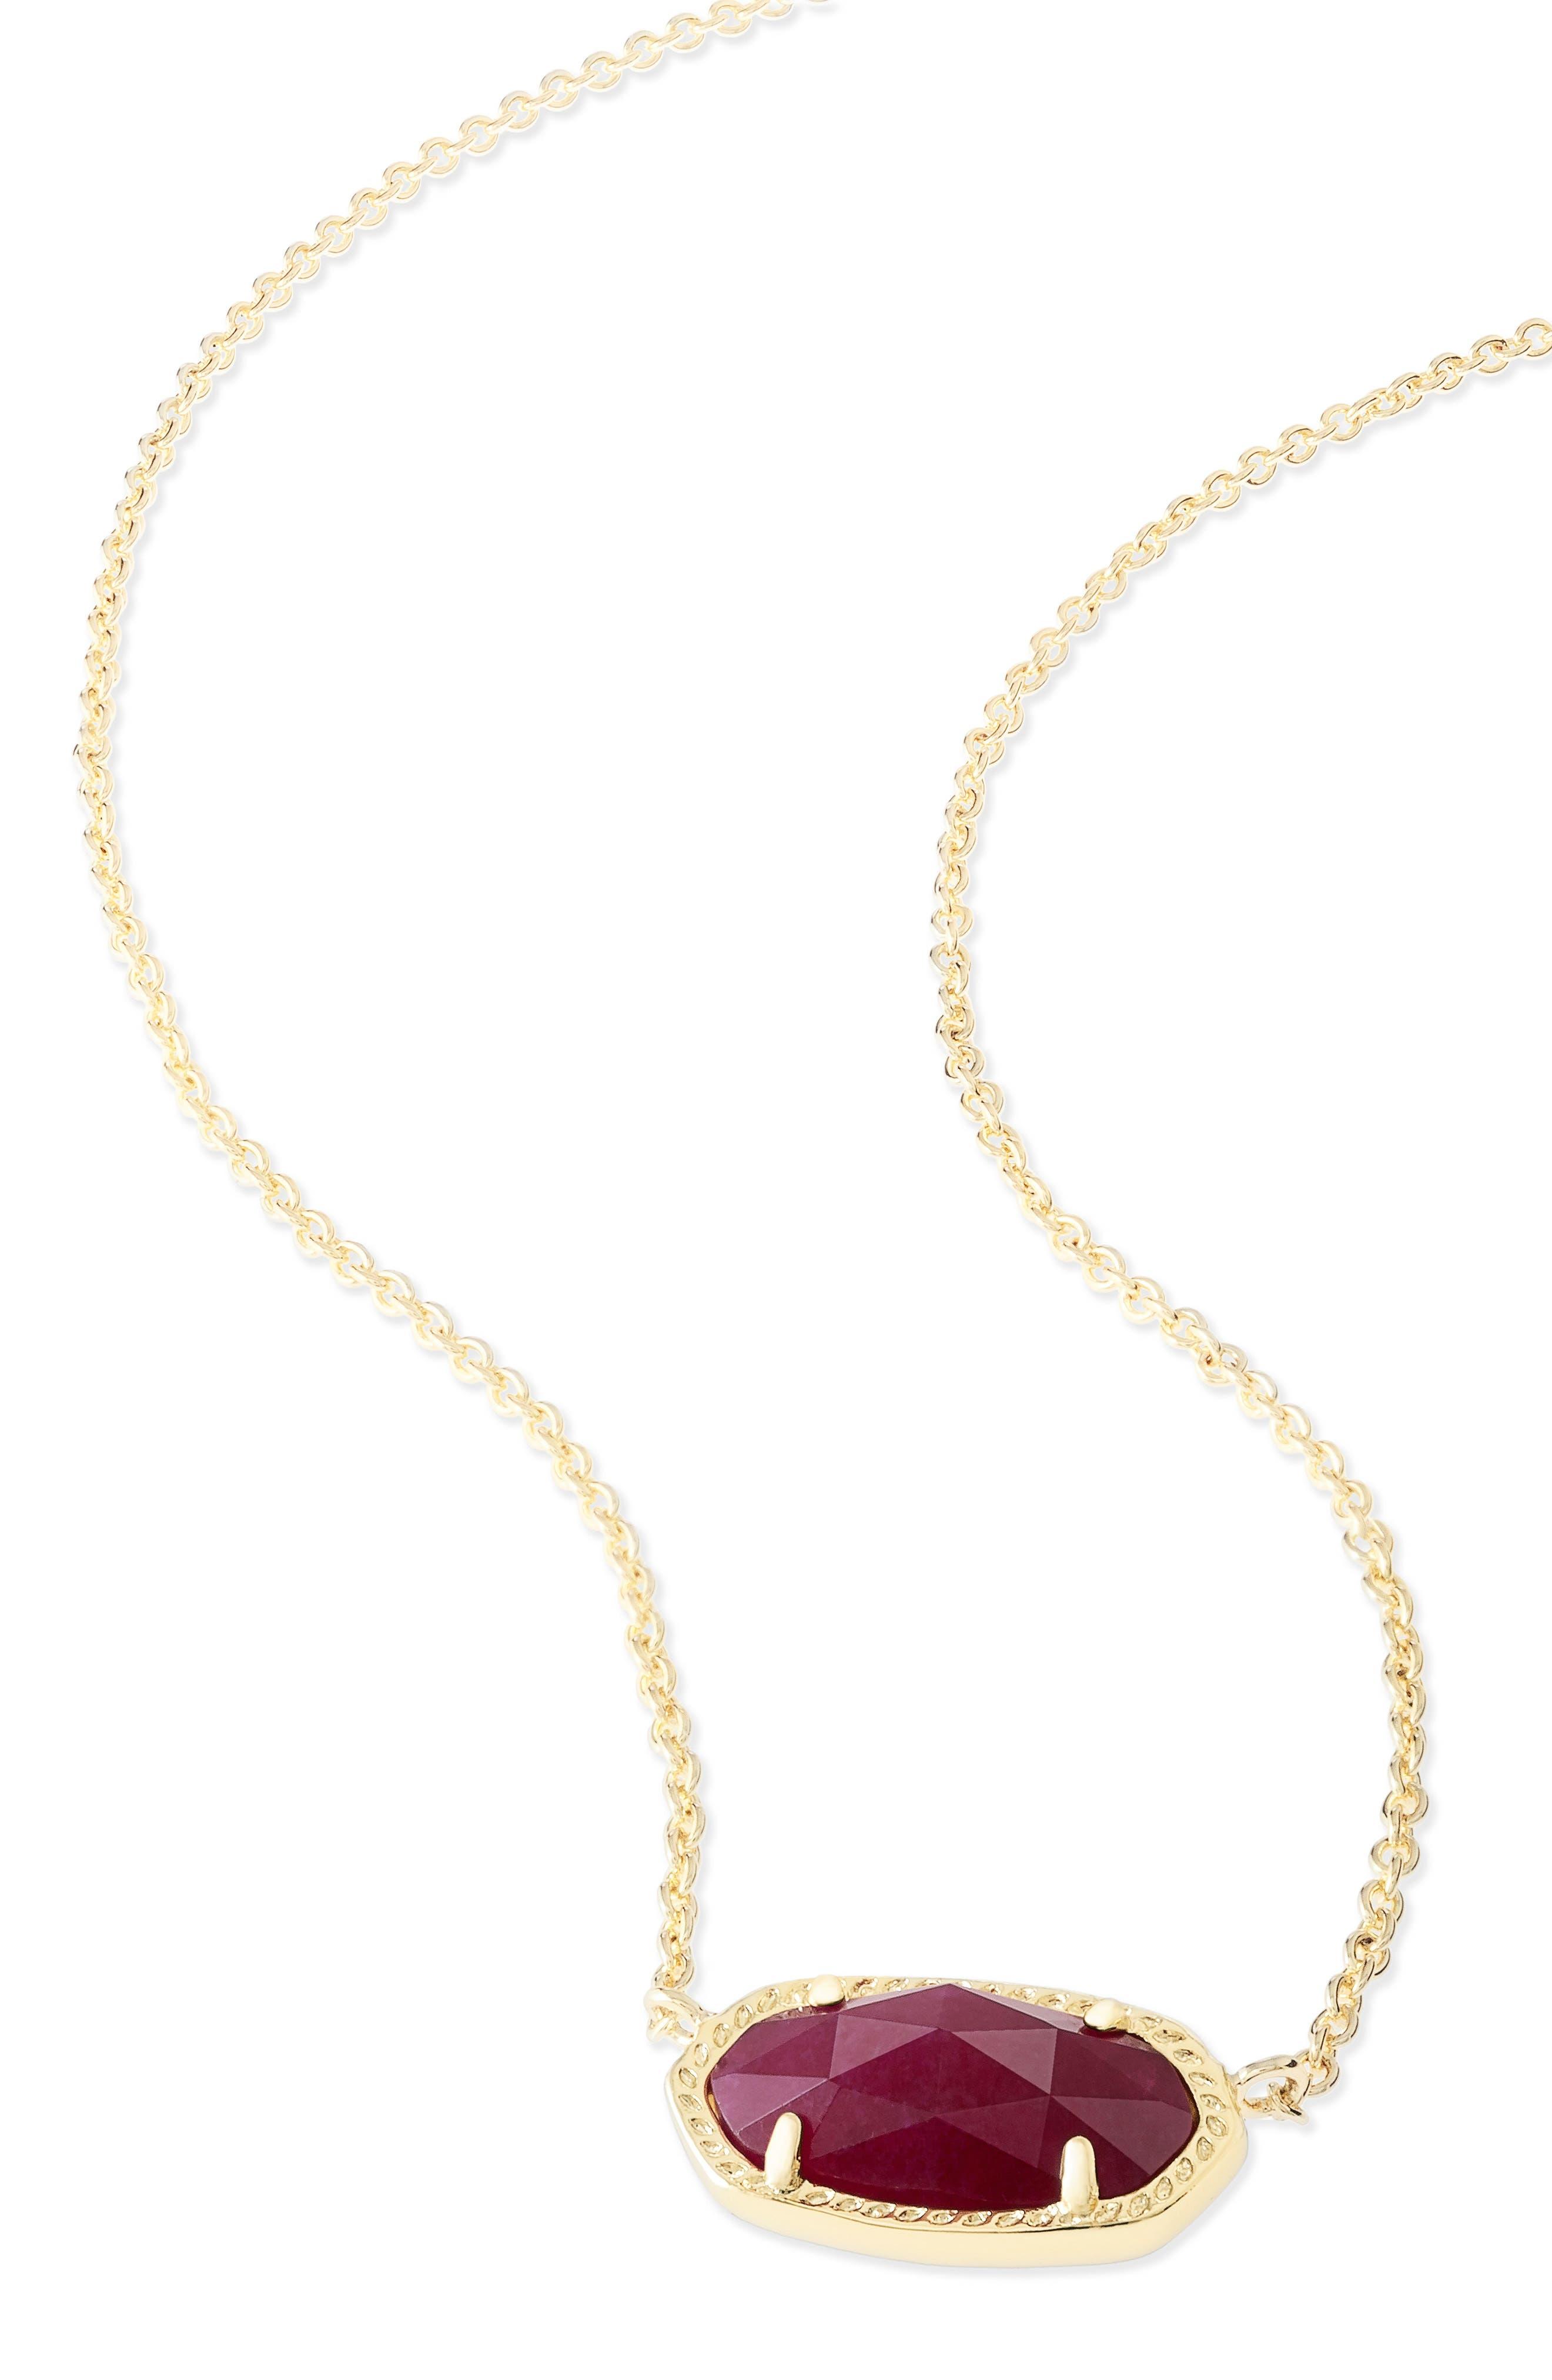 Elisa Pendant Necklace,                             Alternate thumbnail 3, color,                             Maroon Jade/ Gold